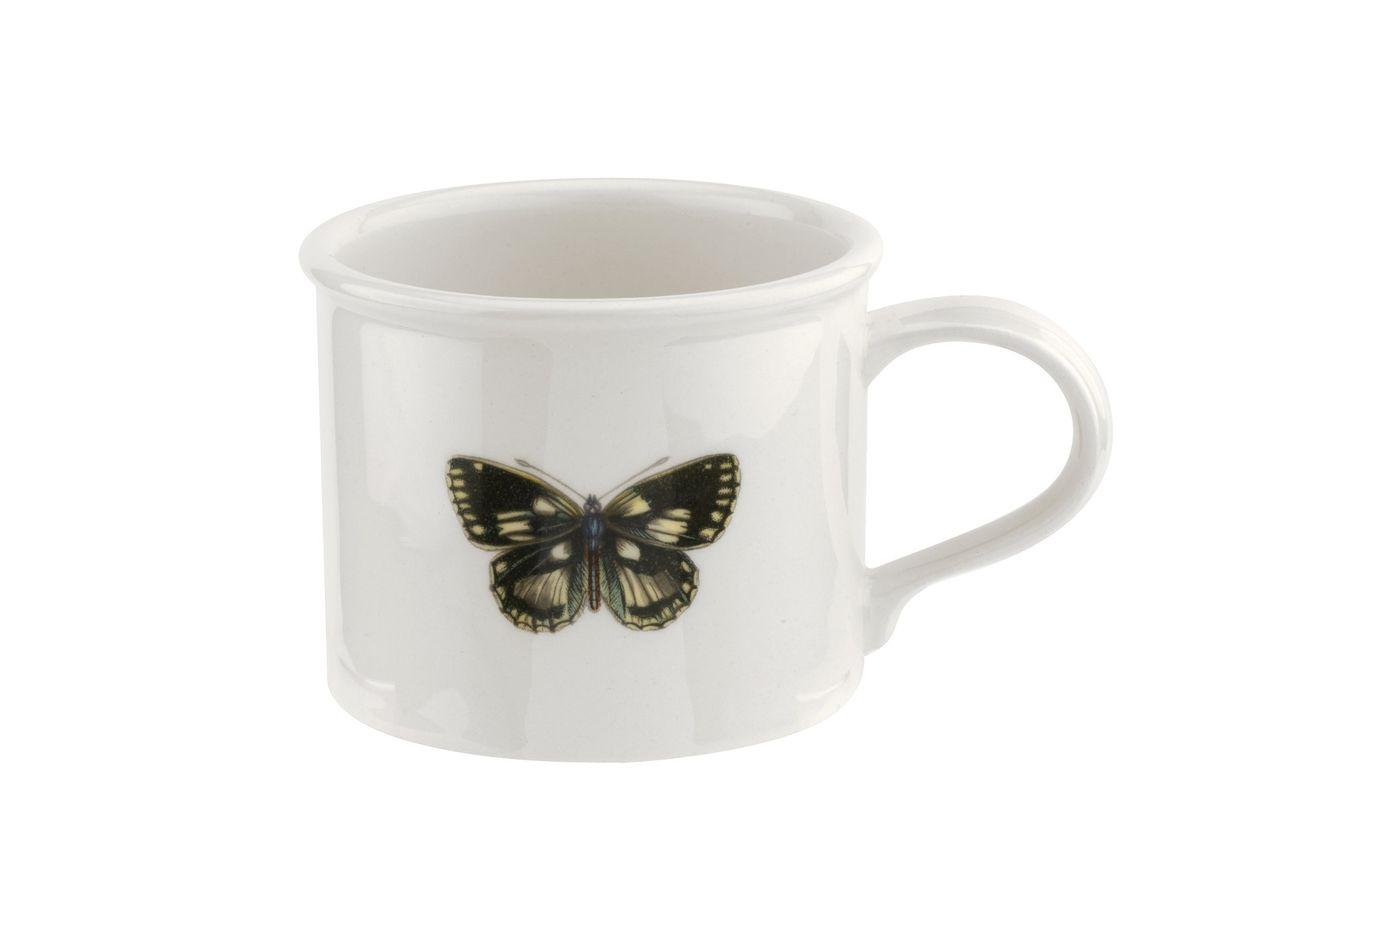 Portmeirion Botanic Garden Harmony Breakfast Cup & Saucer Moss Green 260ml thumb 3